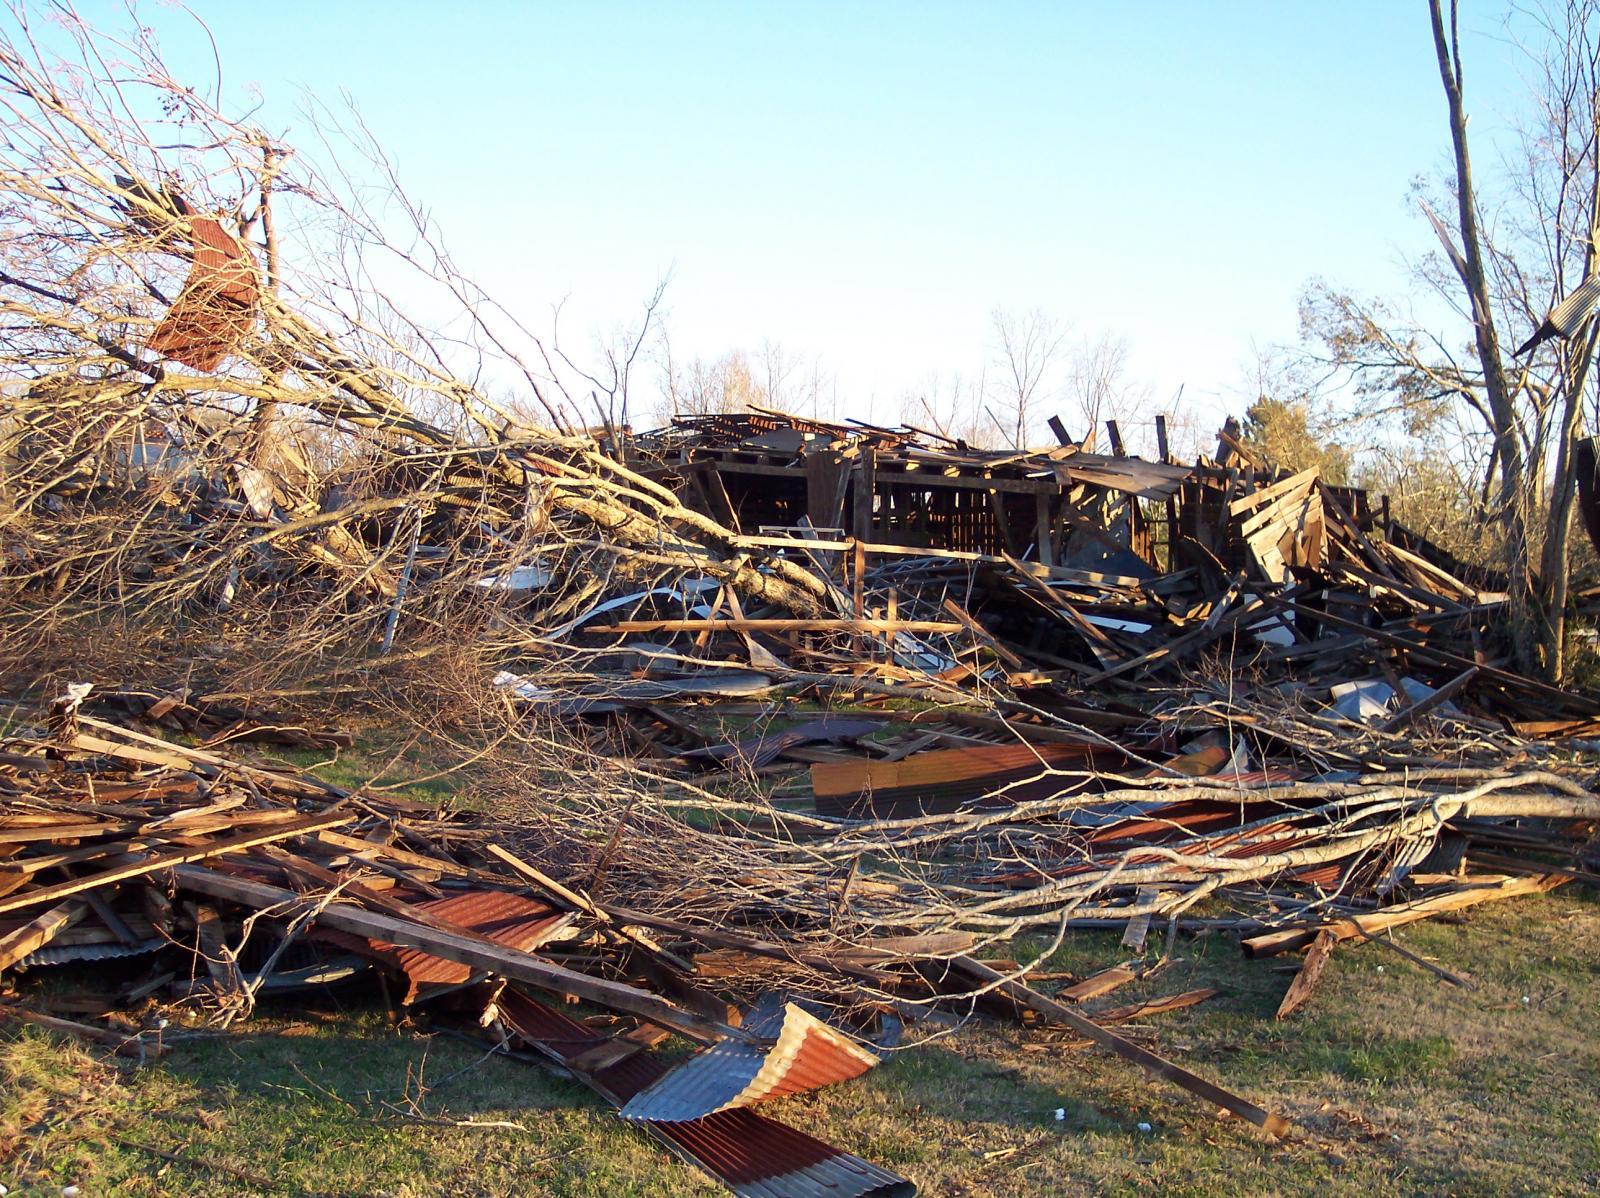 November 15, 2005 Tornado Outbreak